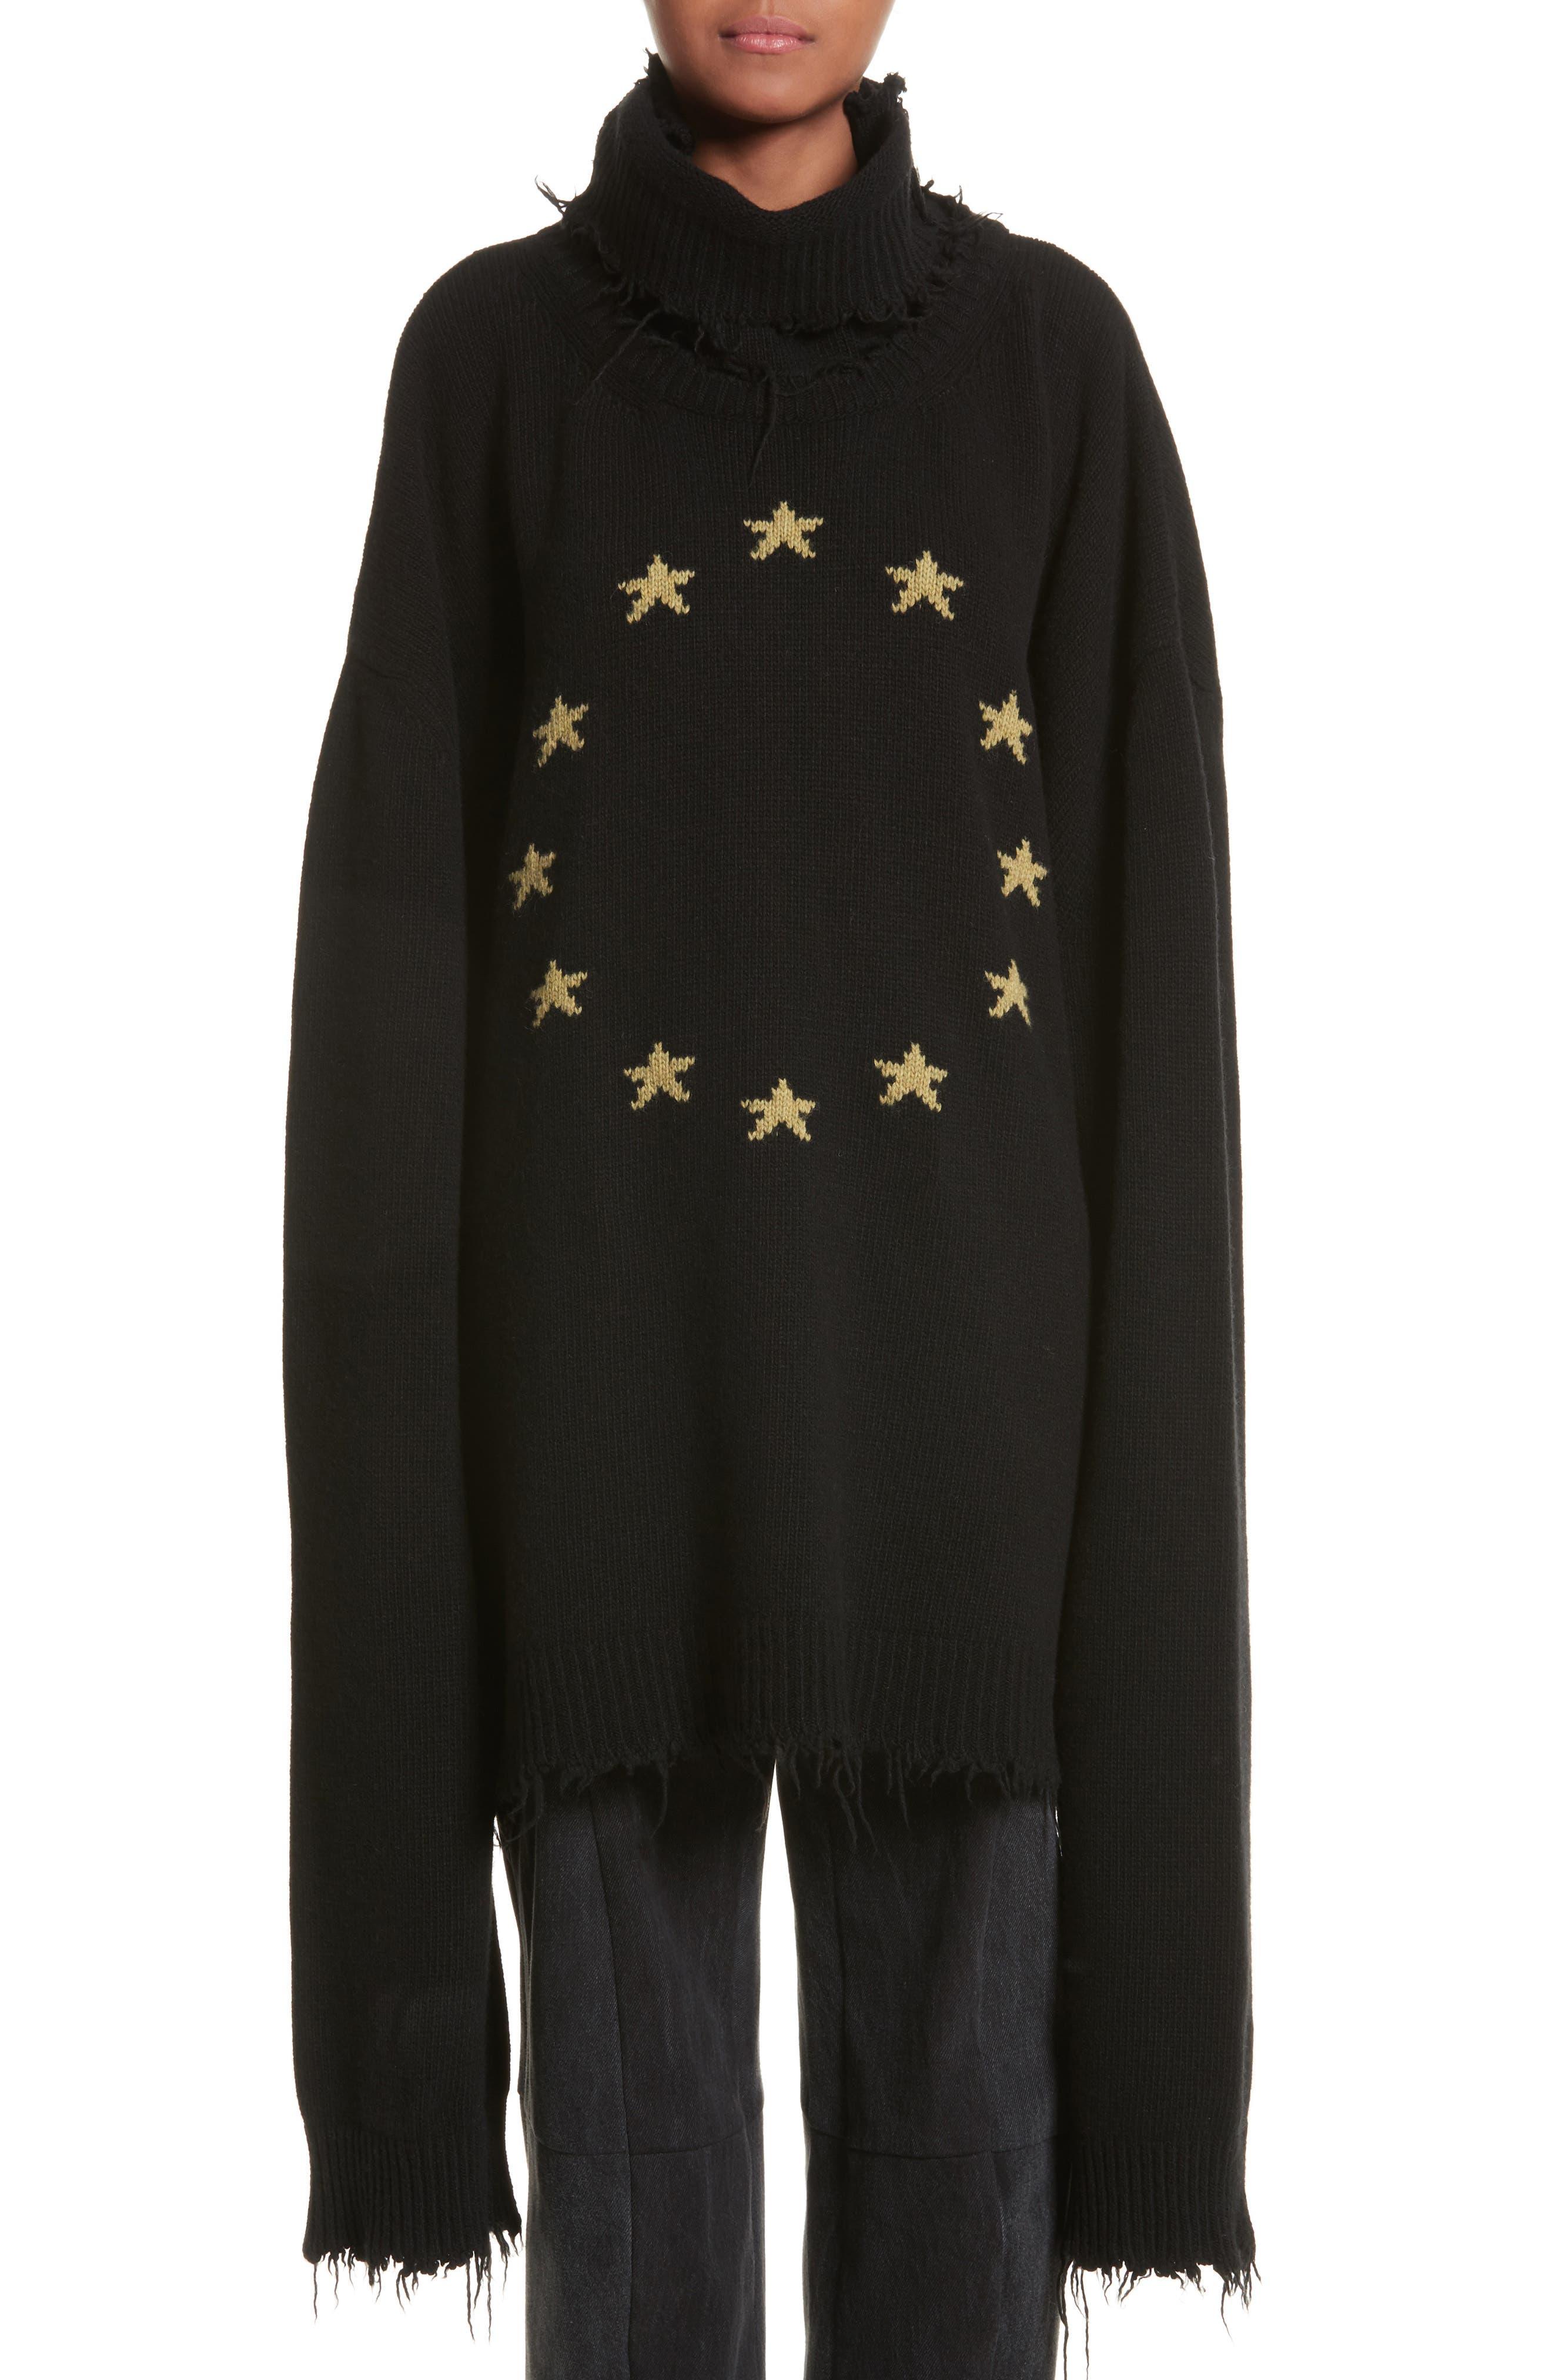 Main Image - Vetements Star Turtleneck Sweater